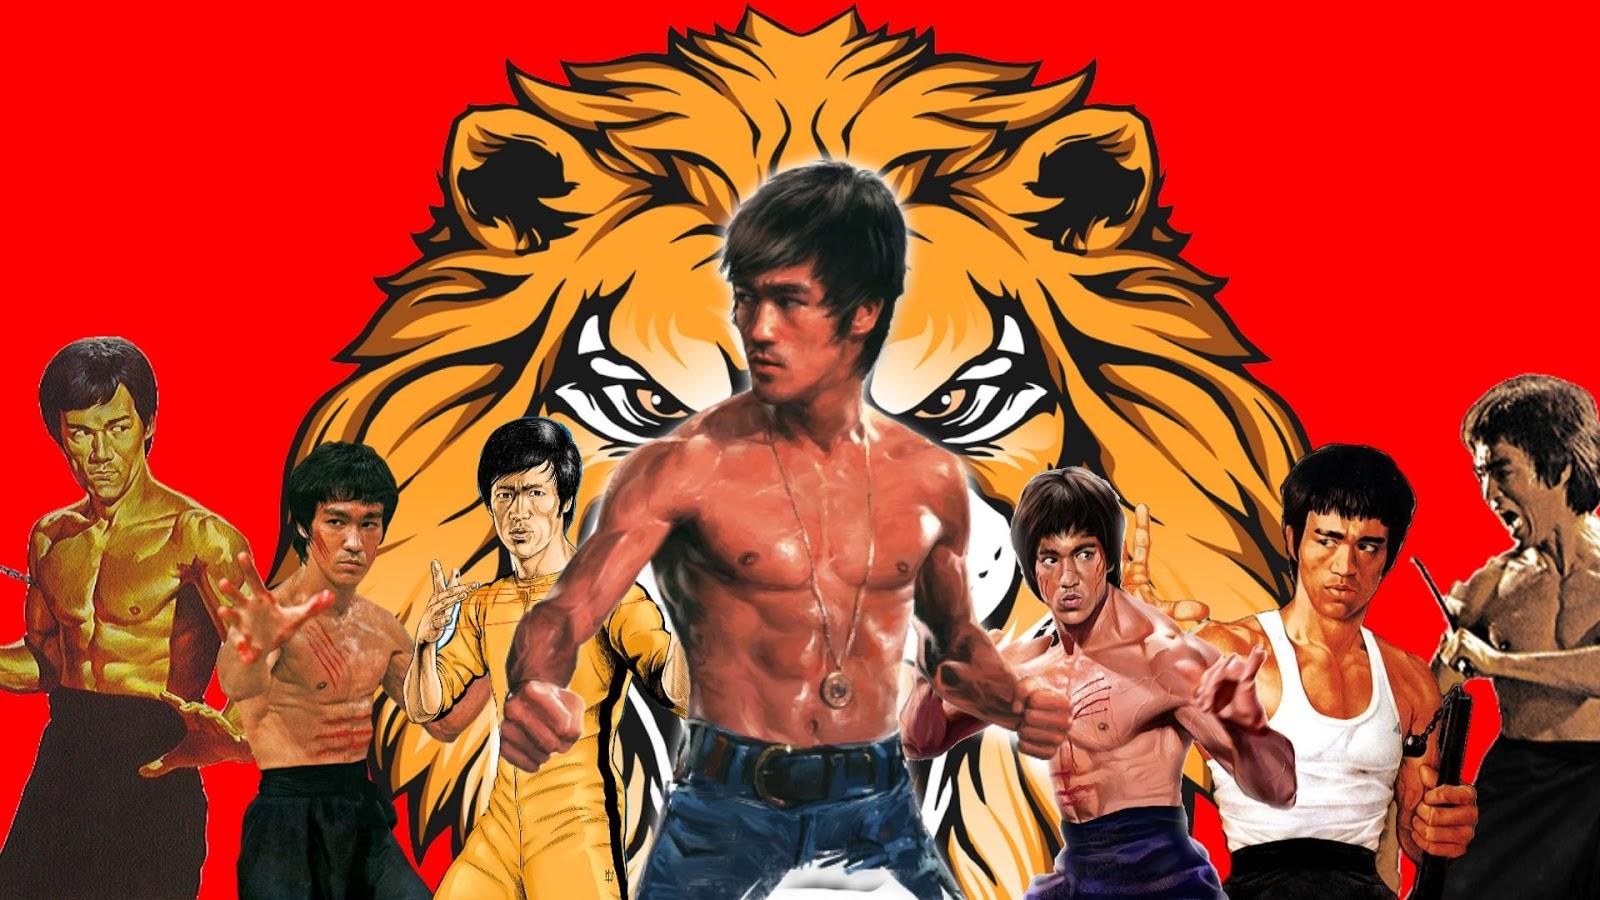 Bruce Lee Wallpaper for Desktop